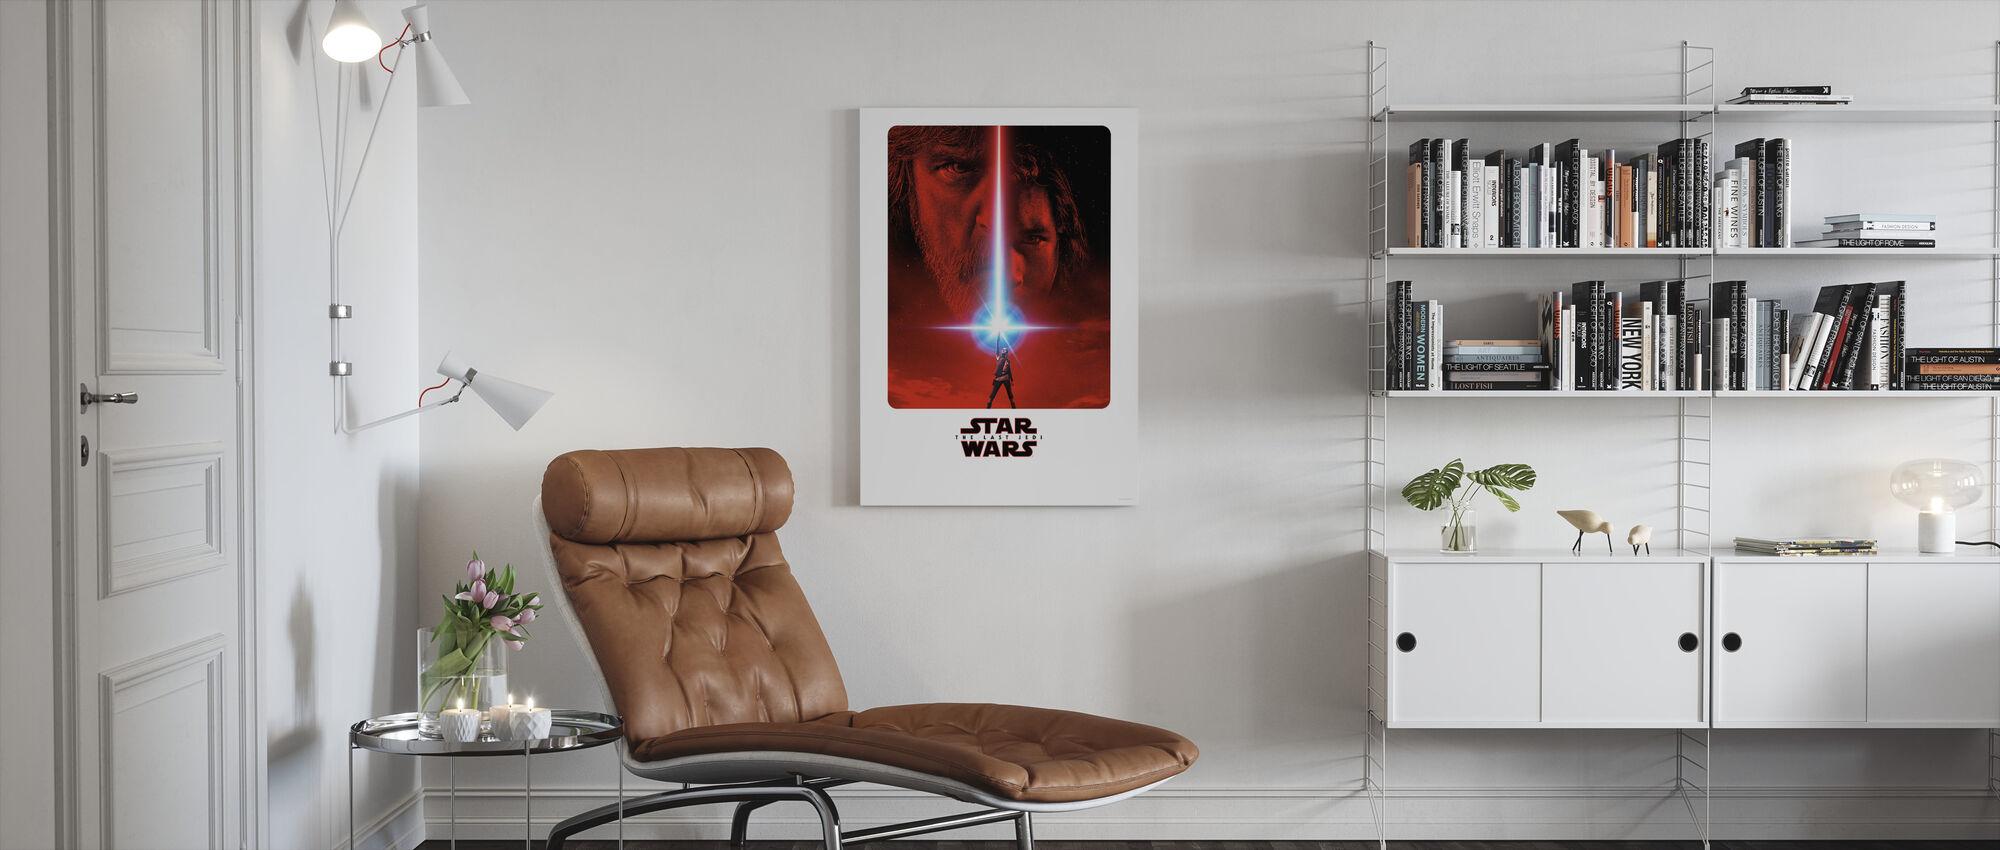 Star Wars - siste Jedi film plakat - Lerretsbilde - Stue